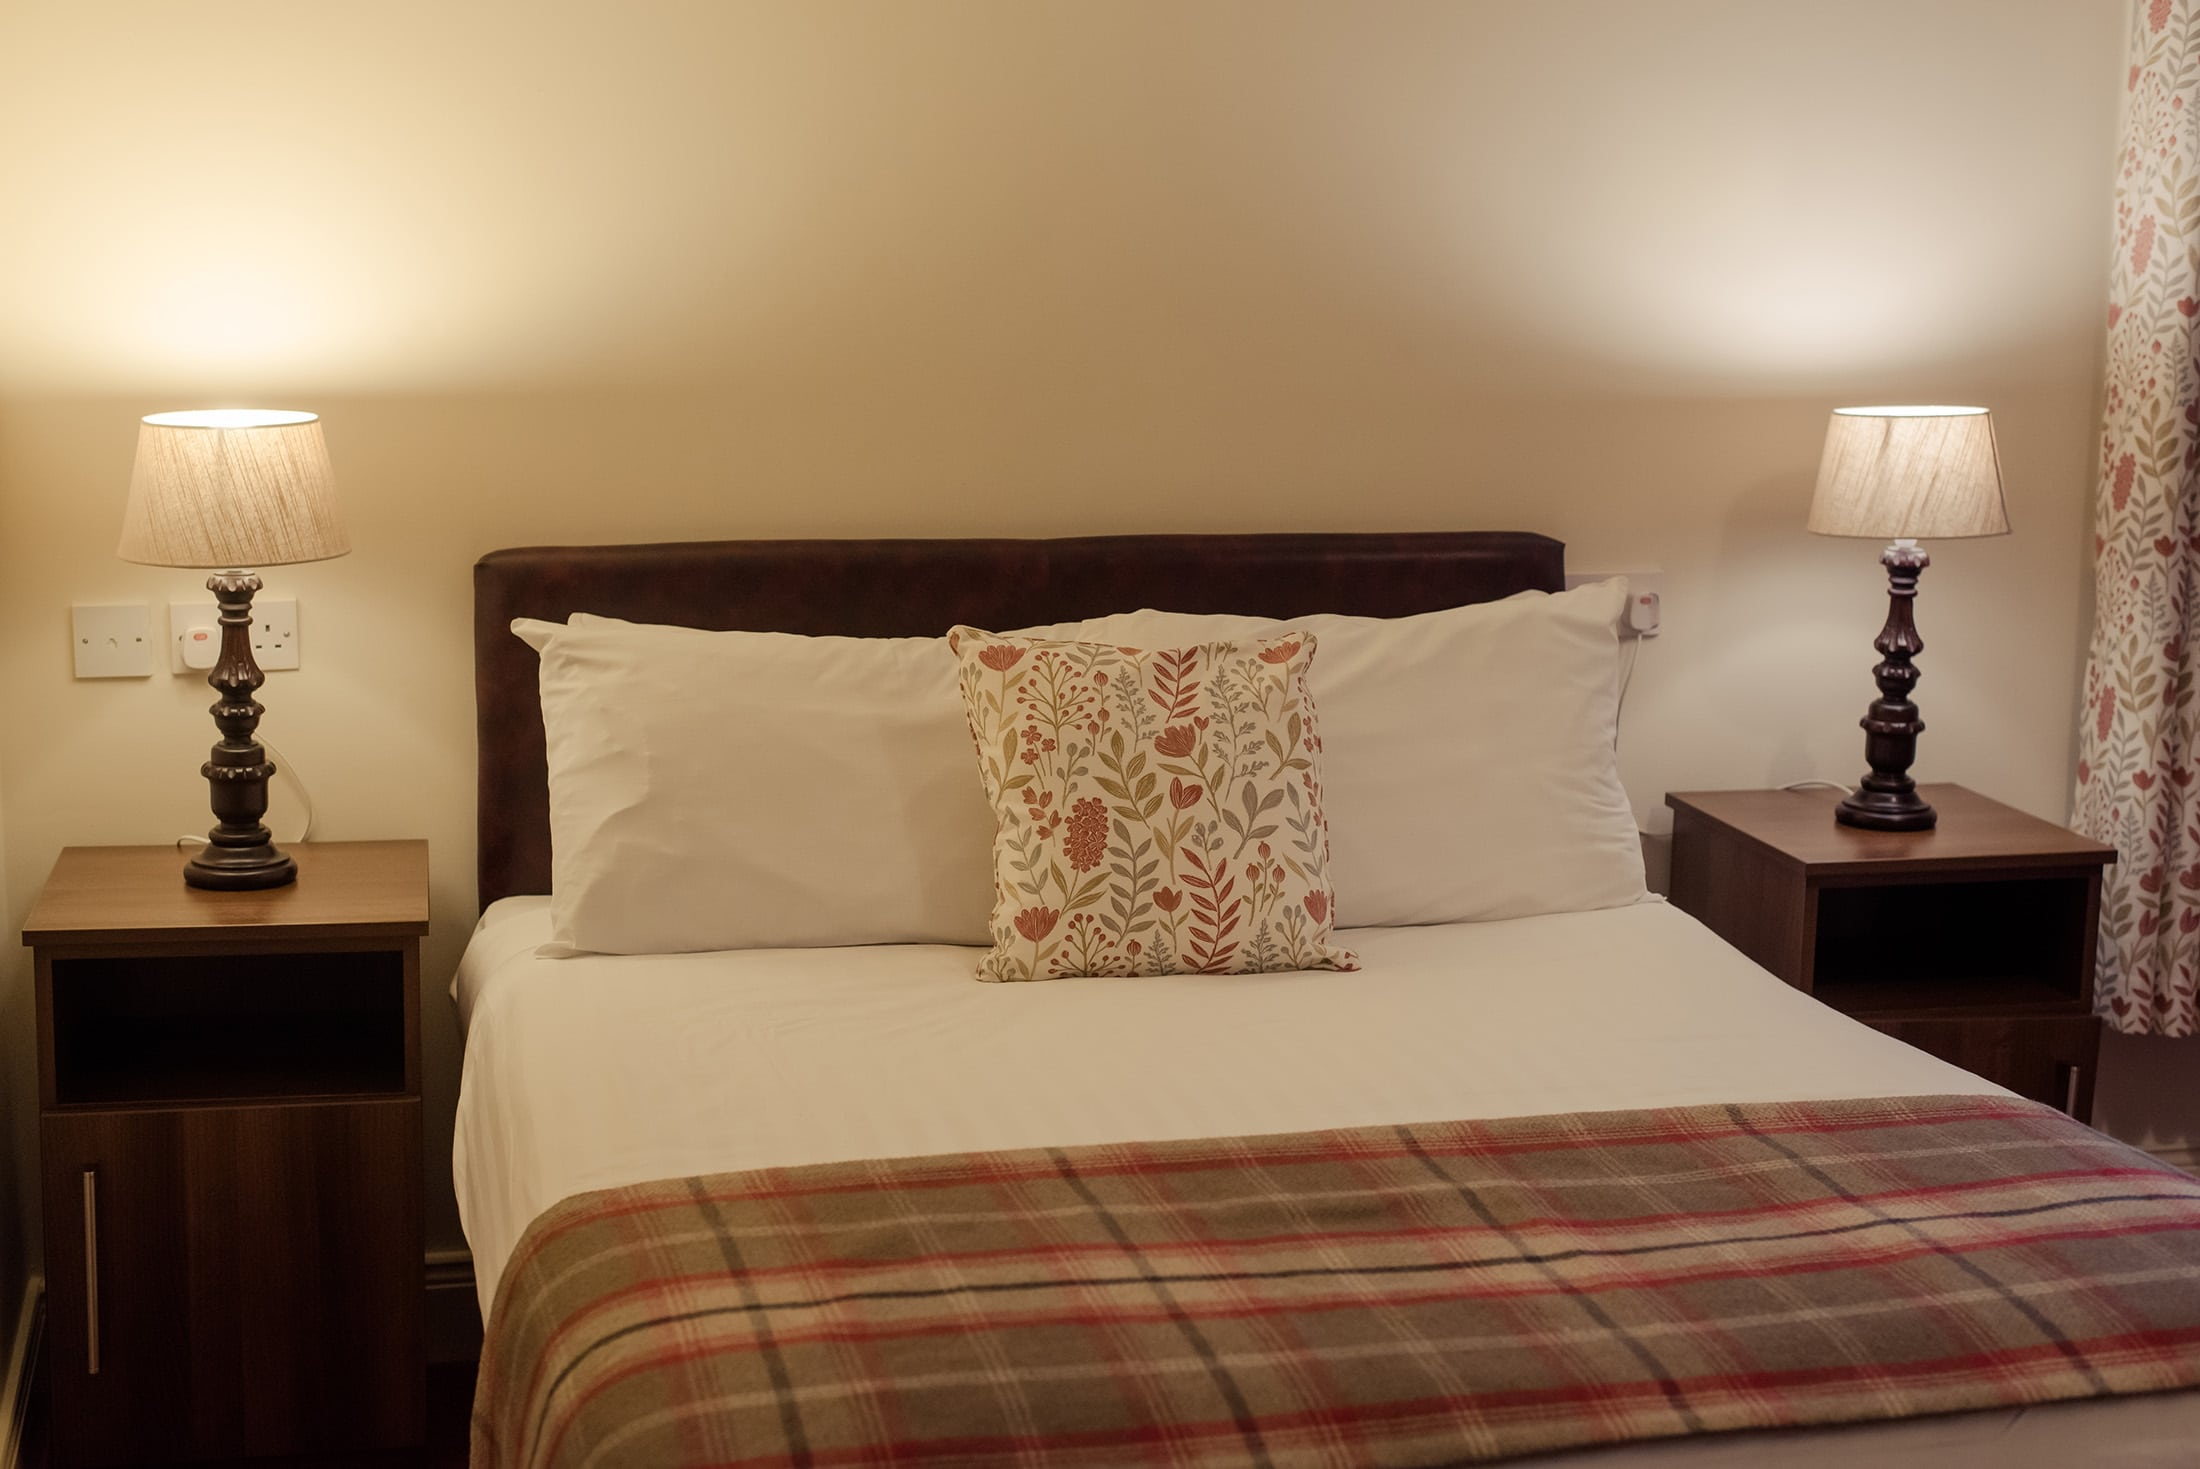 Accommodation at Ballykealey House